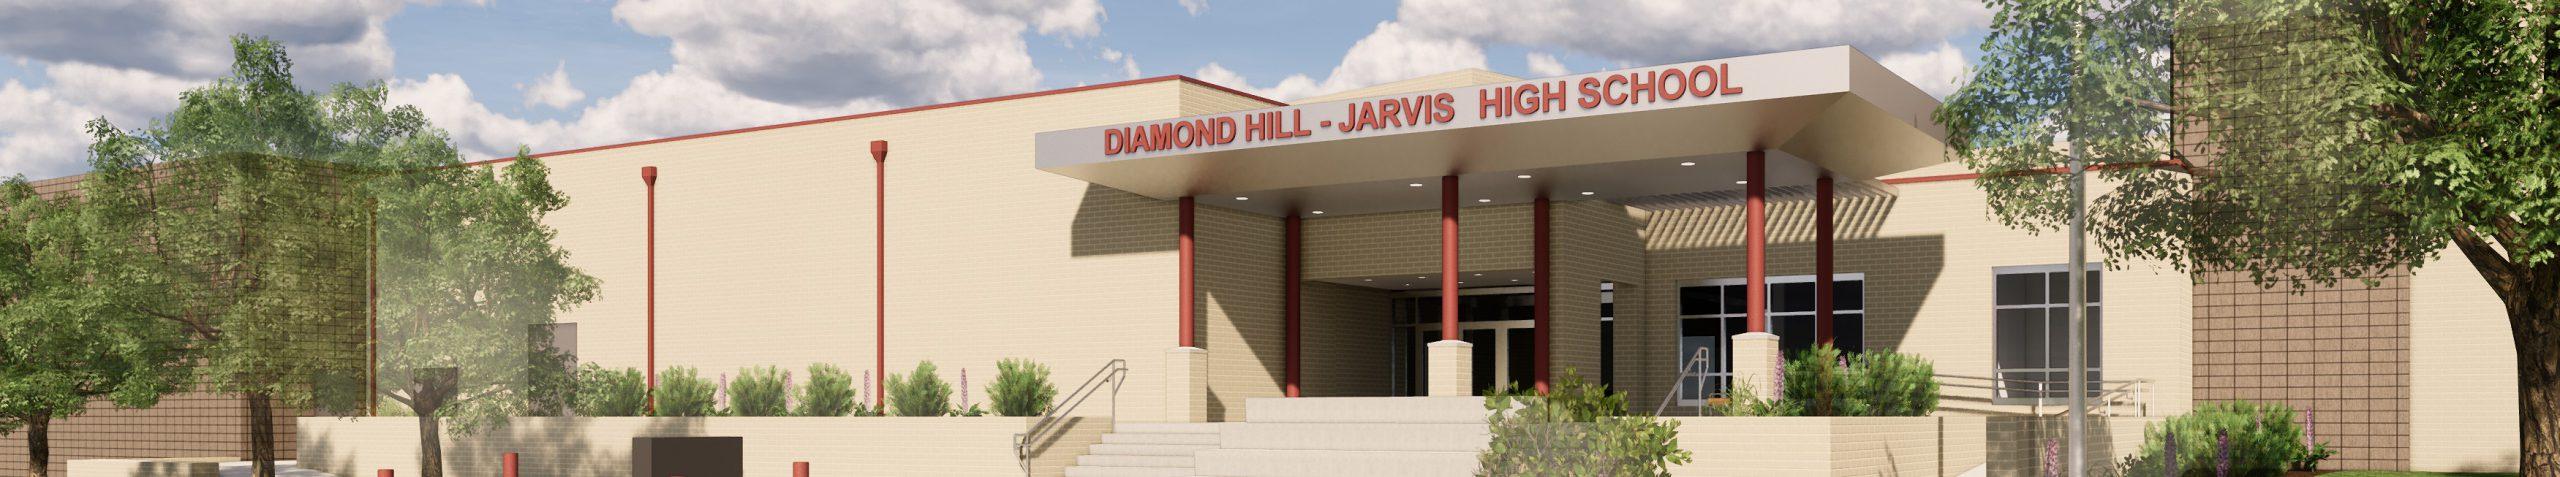 Diamond Hill-Jarvis Addition & Renovation